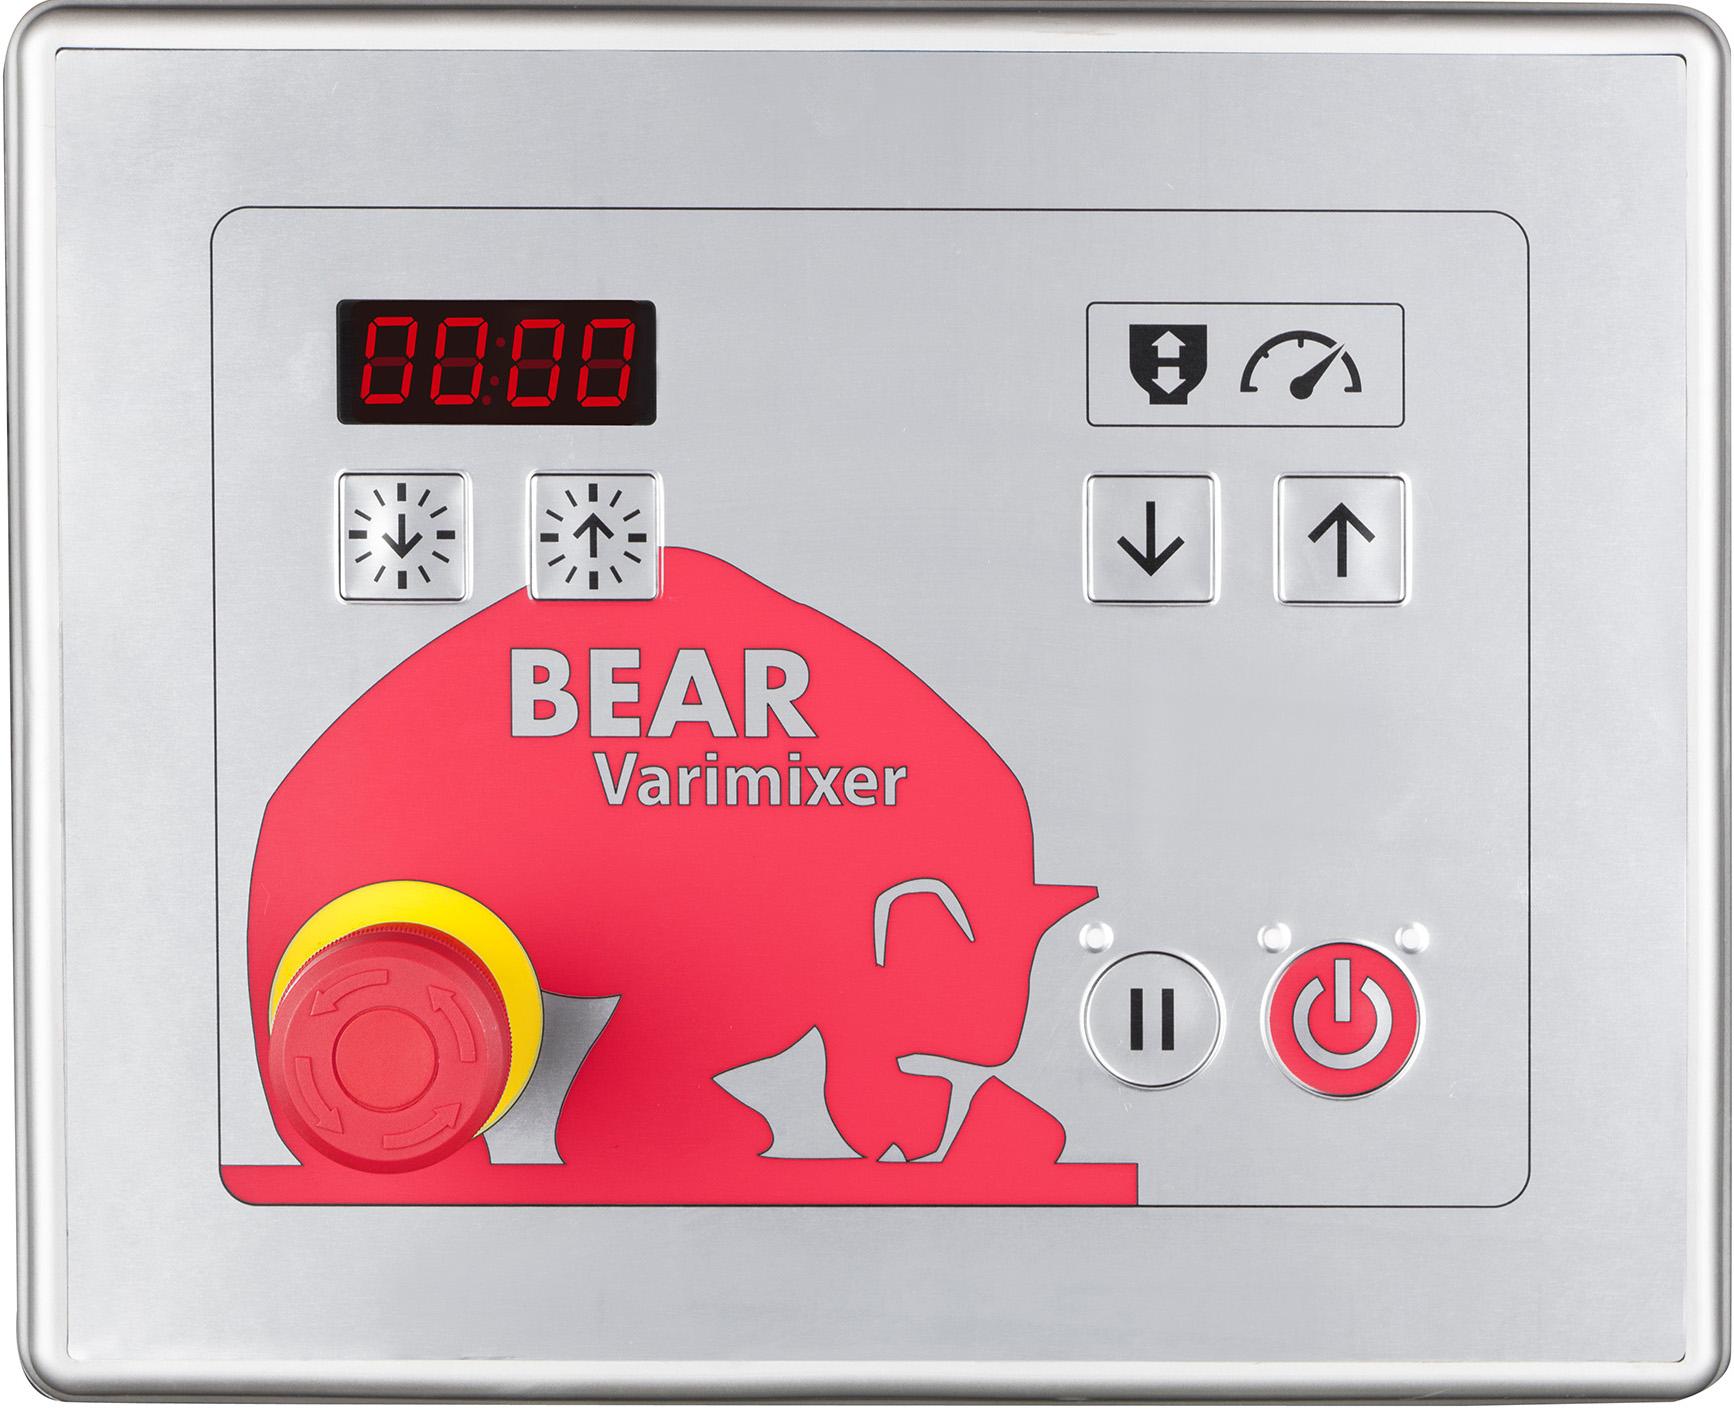 BEAR VARIMIXER Панель управления VL-1L (AR100-AR200)